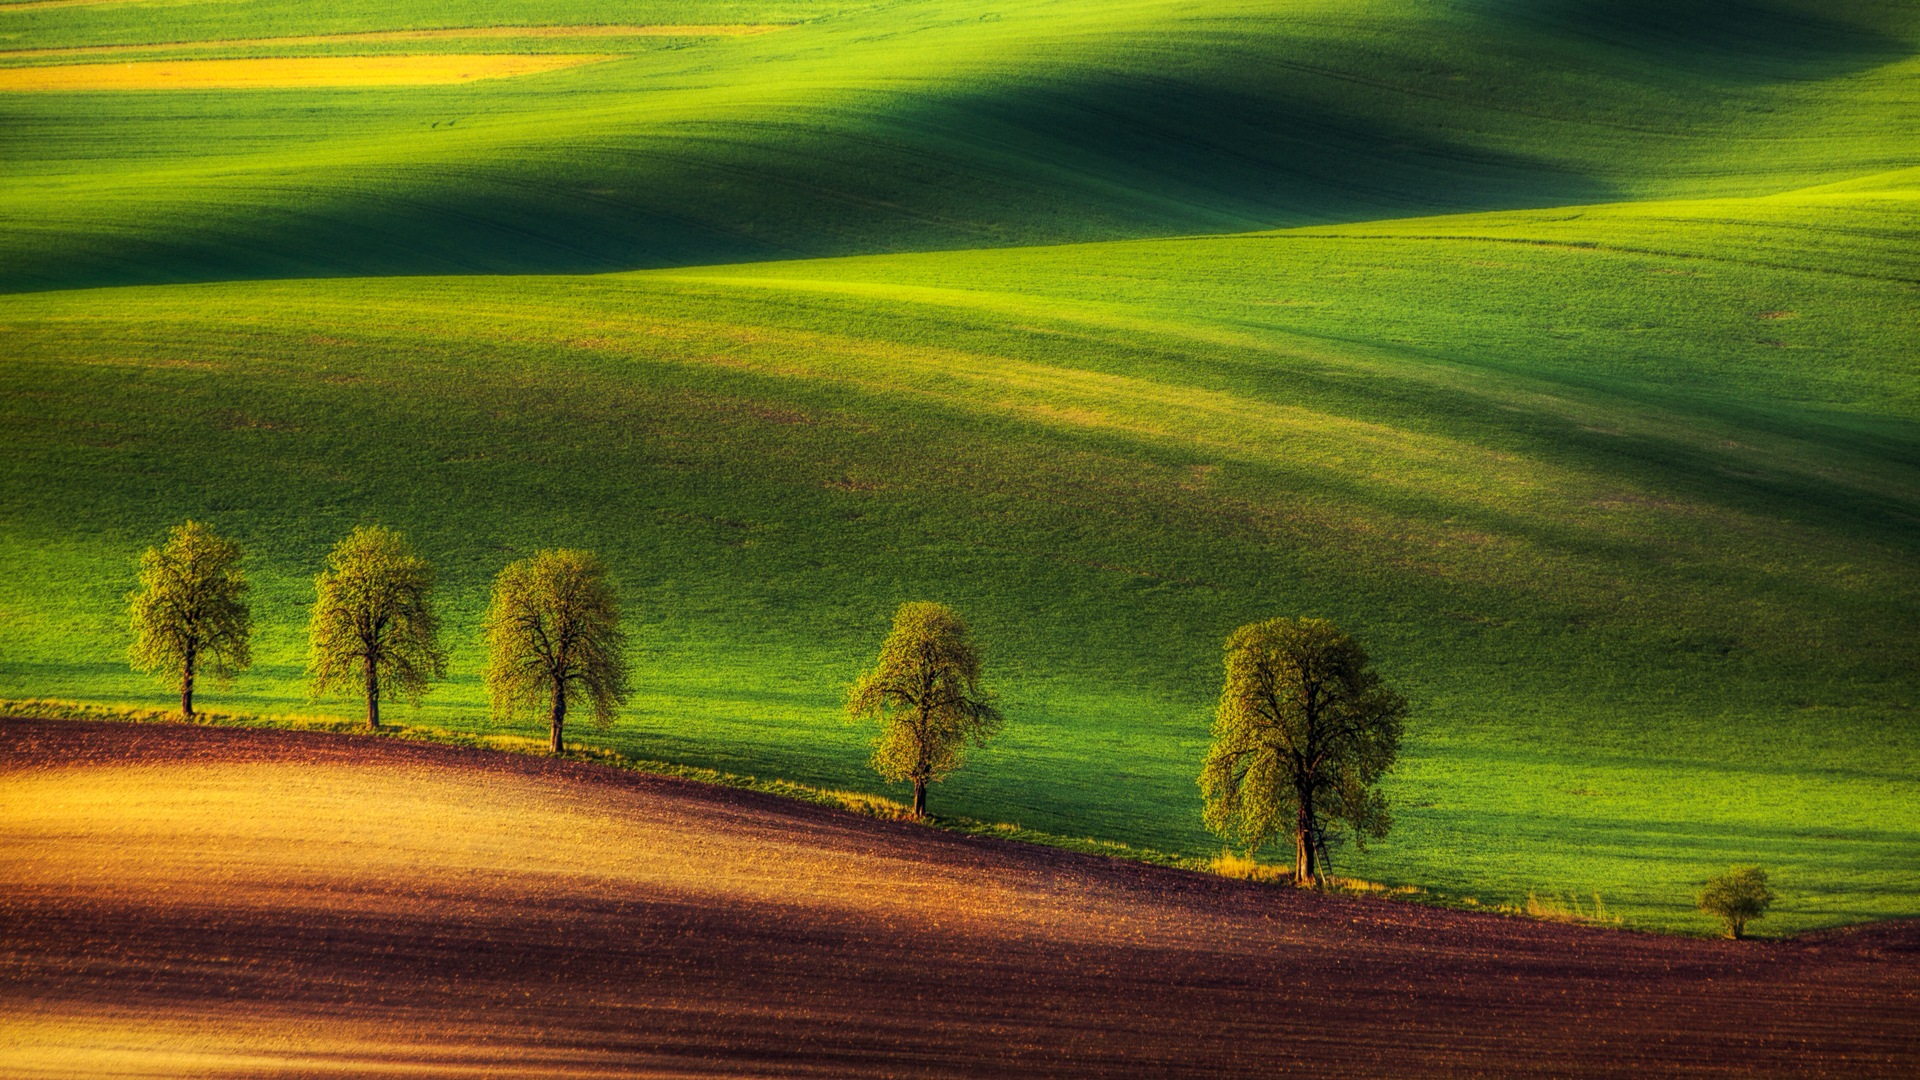 Windows 10 Preview Wallpapers Pack - Green Ground Wallpaper Hd - HD Wallpaper